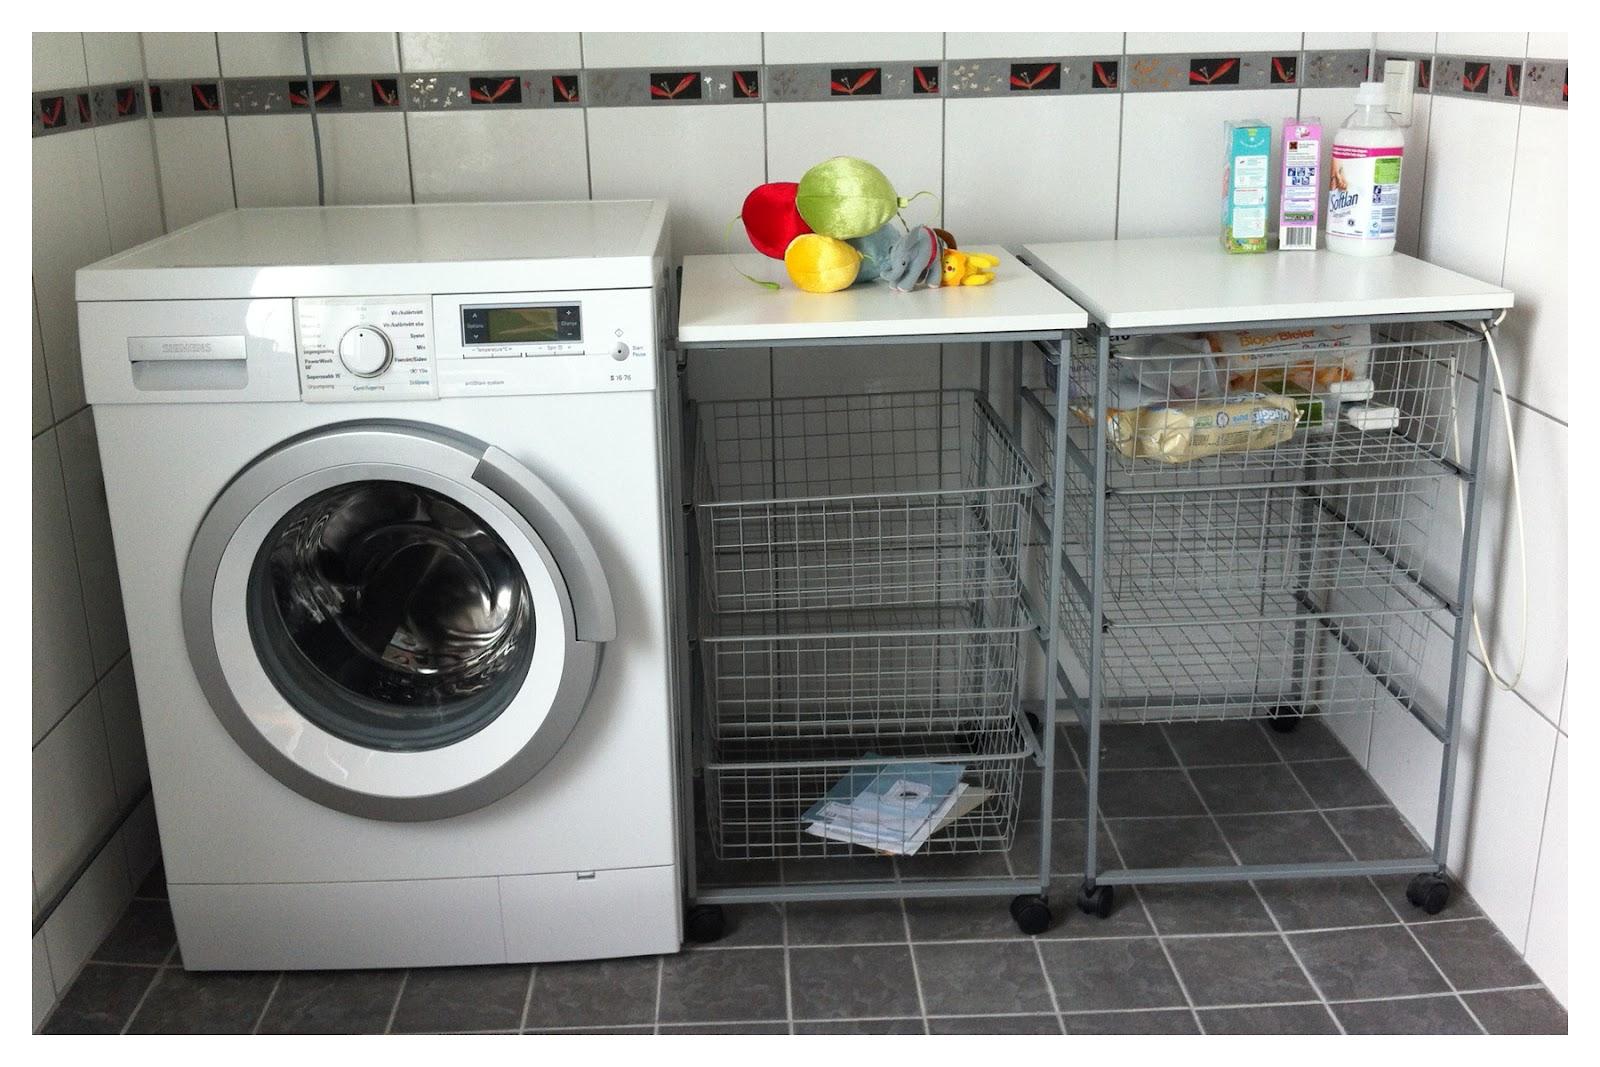 57an: bänk i badrummet & kakfat utan kakor